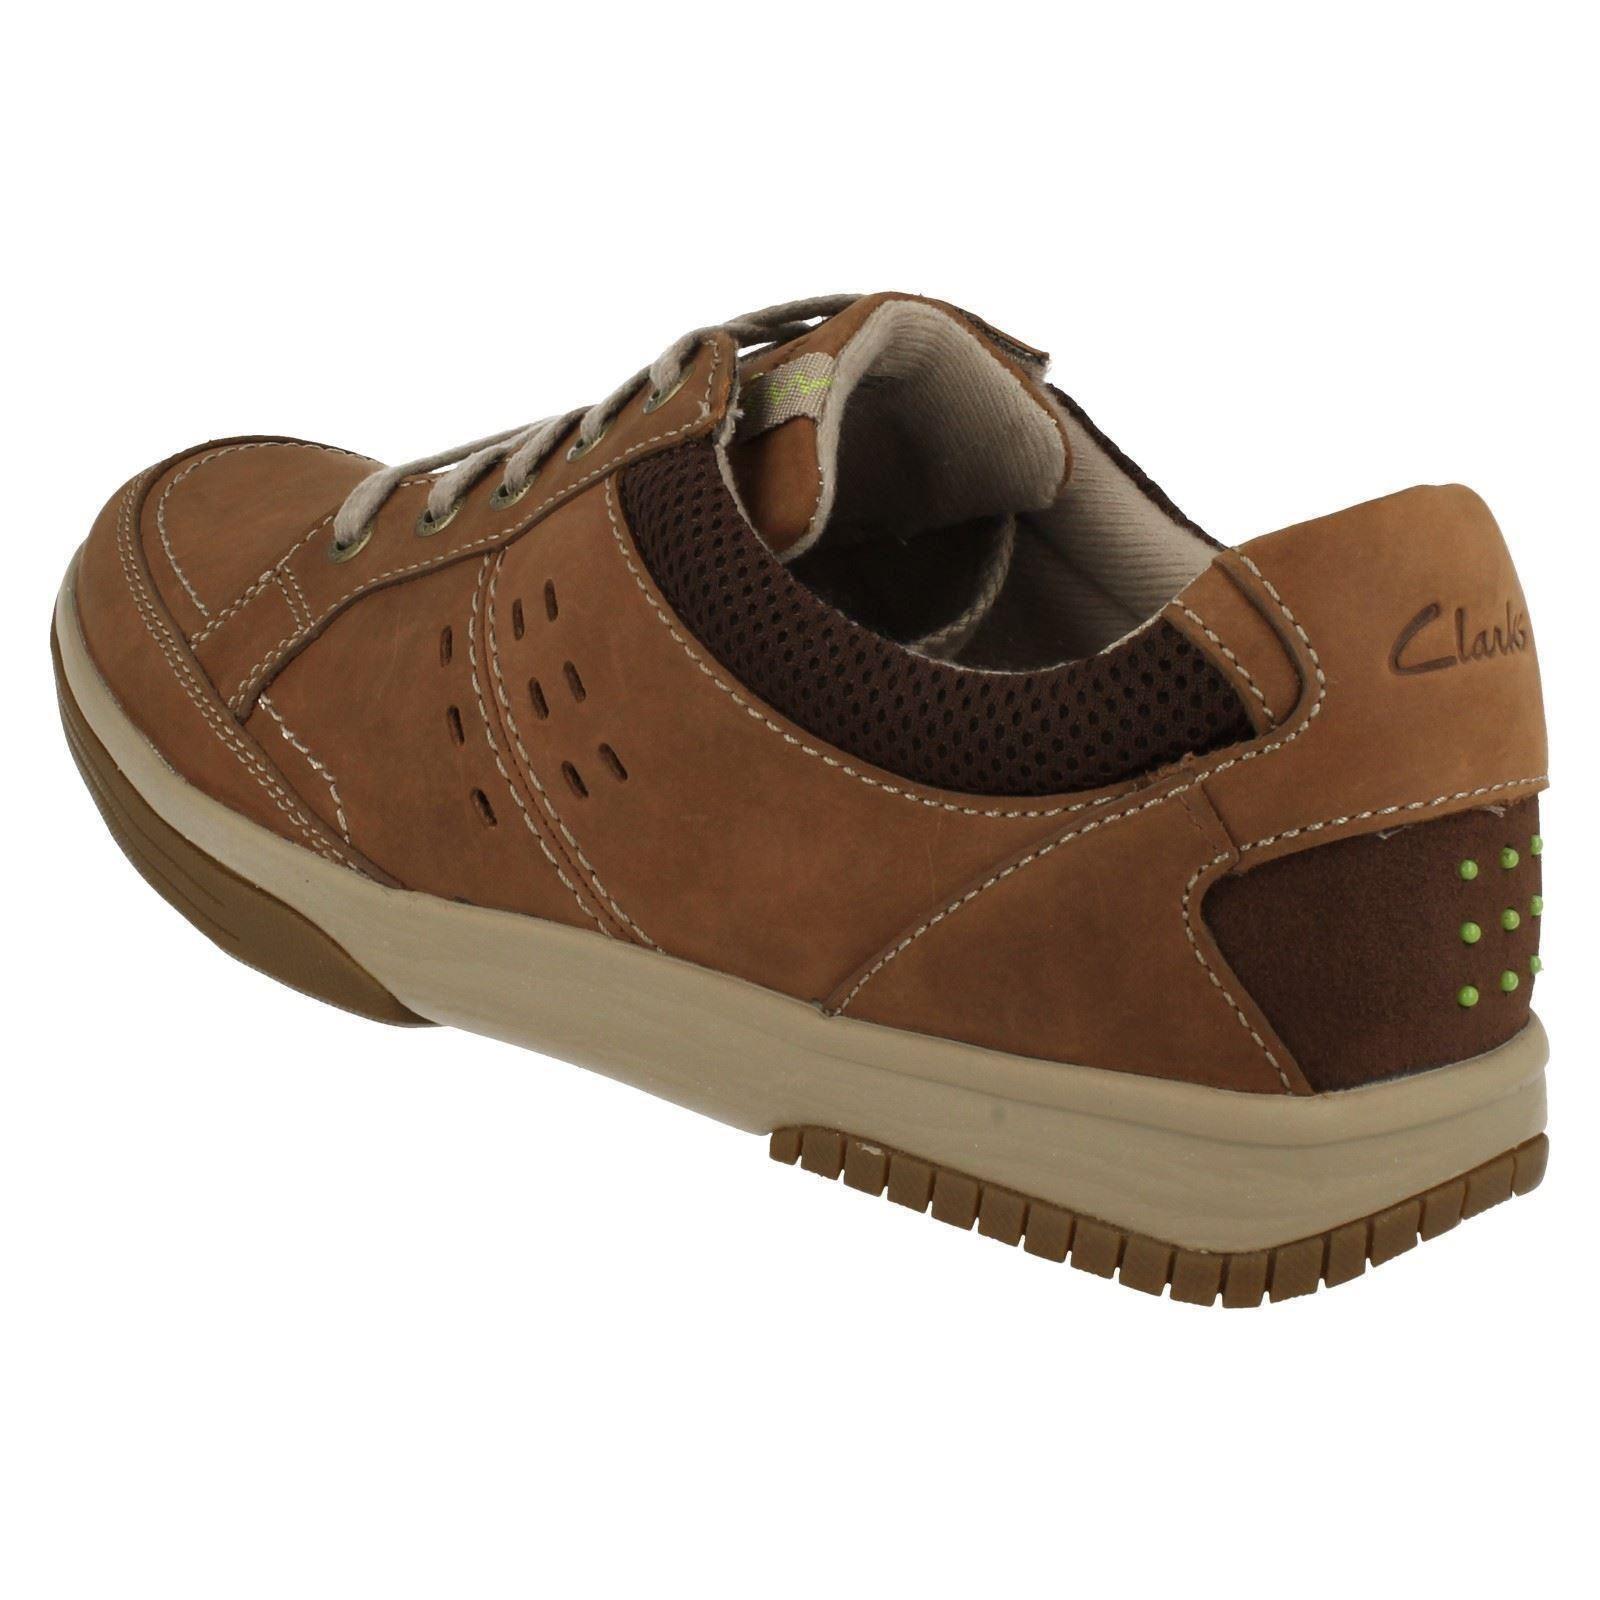 Clarks Wave Path Men S Casual Walking Shoes